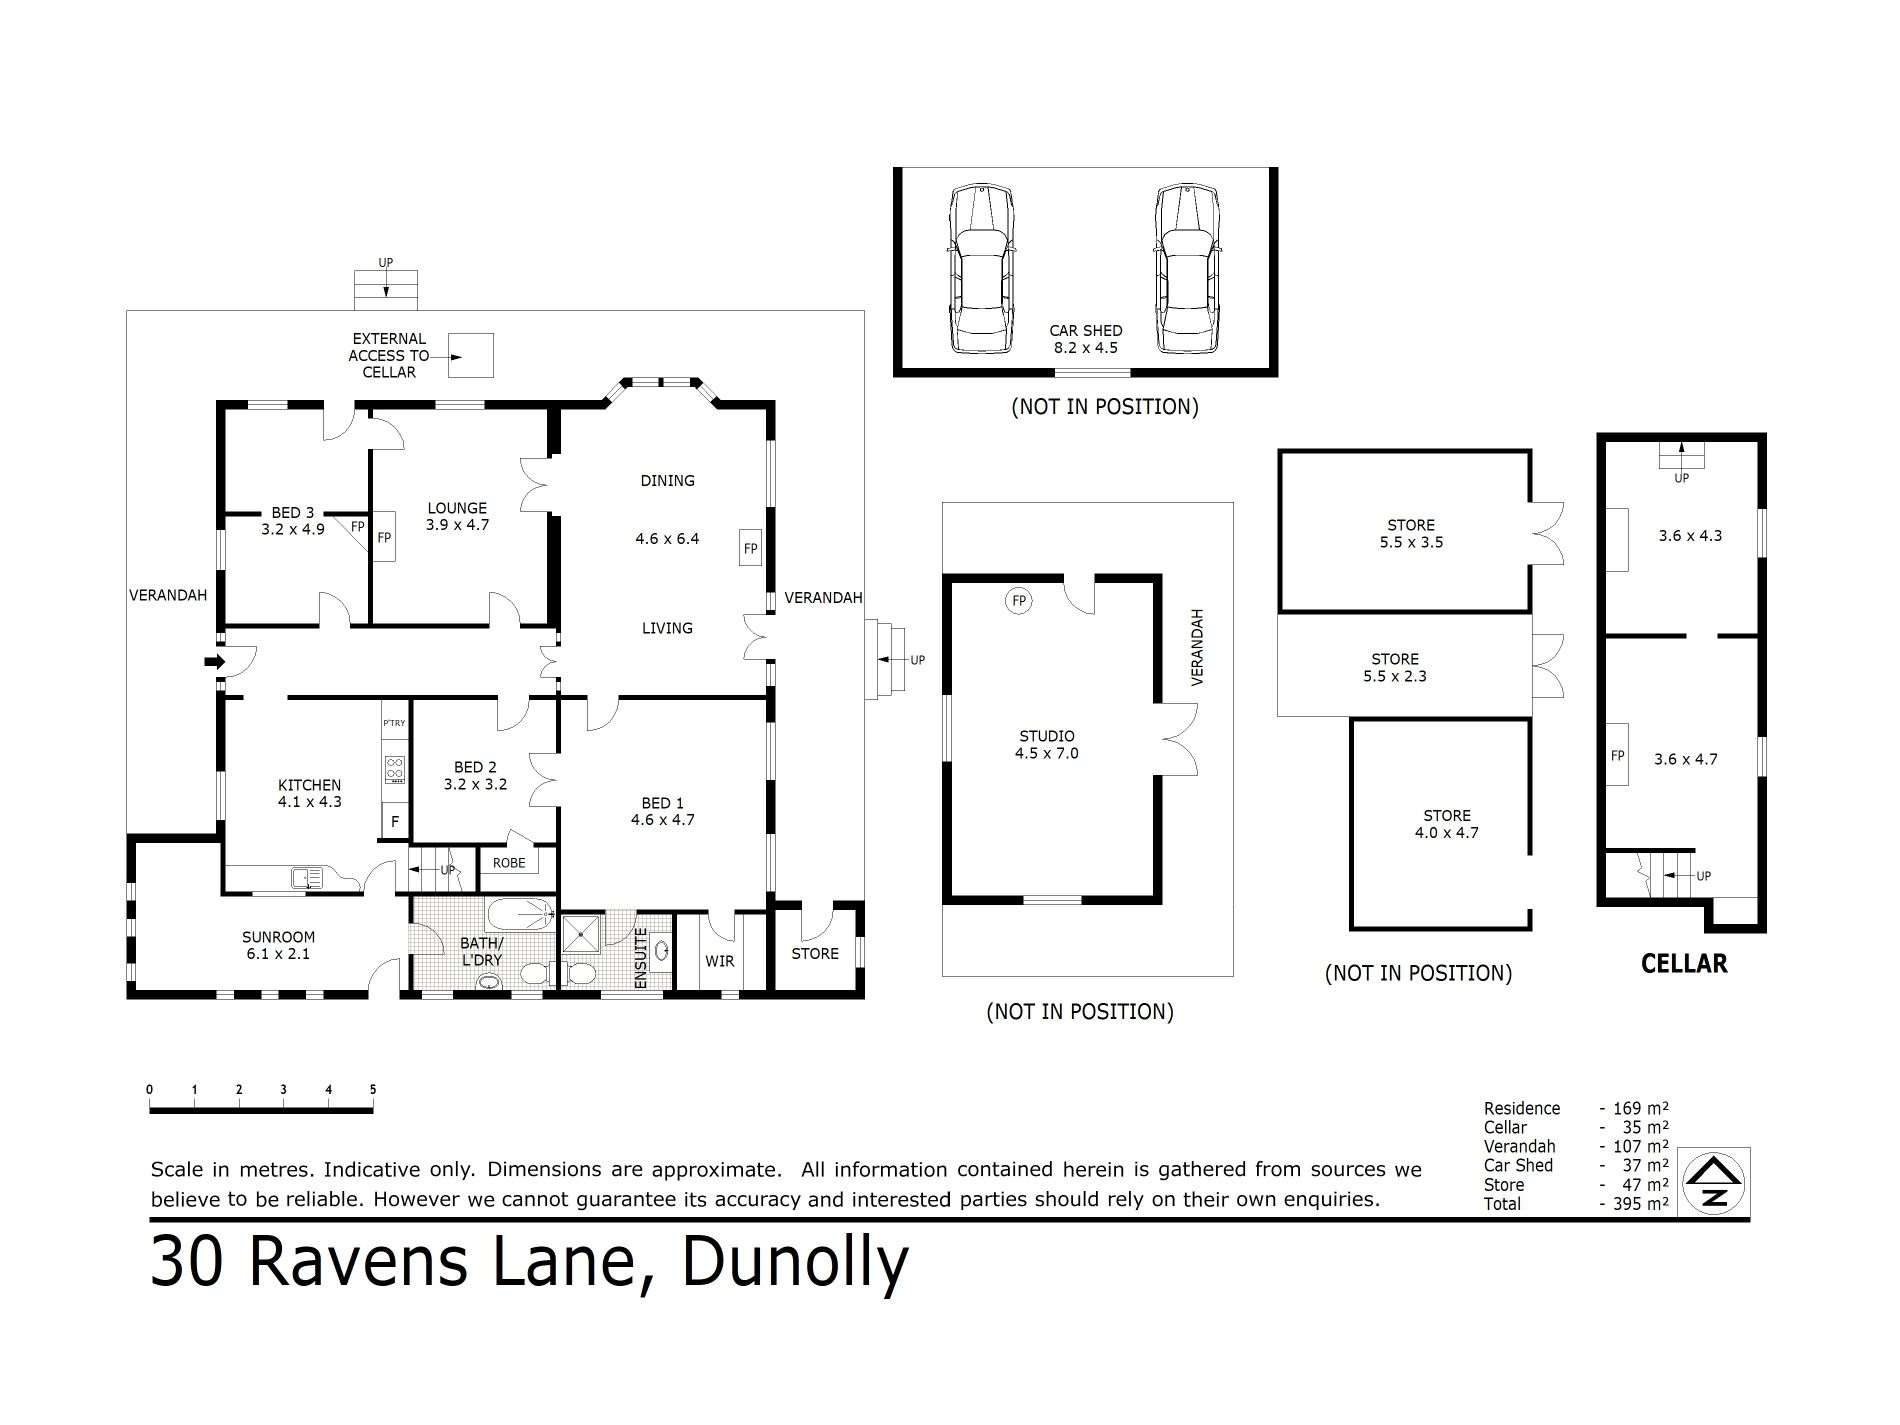 30 Ravens Lane, Dunolly